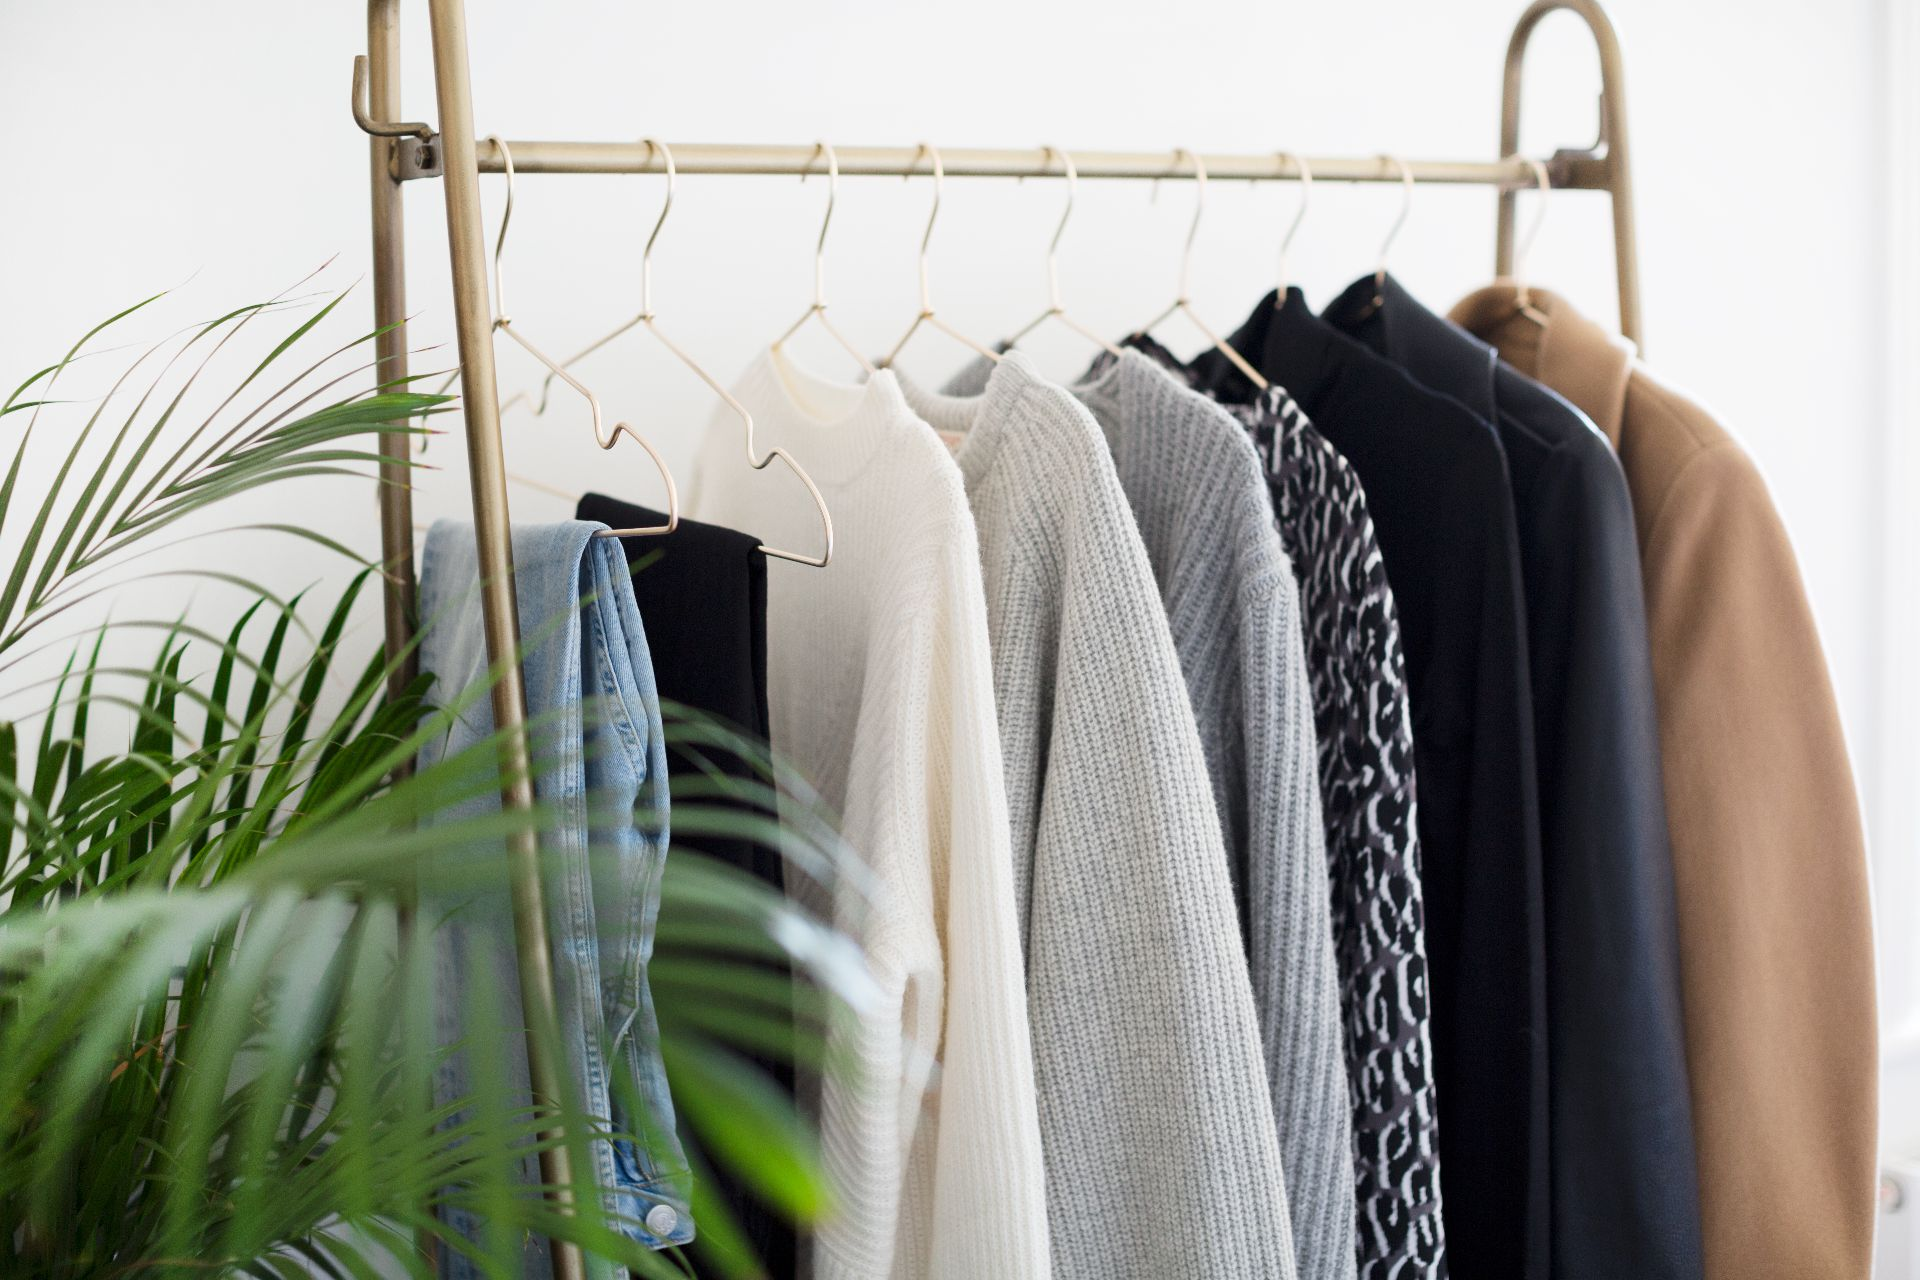 theannaedit-autumn-capsule-wardrobe-most-worn-september-2017-5